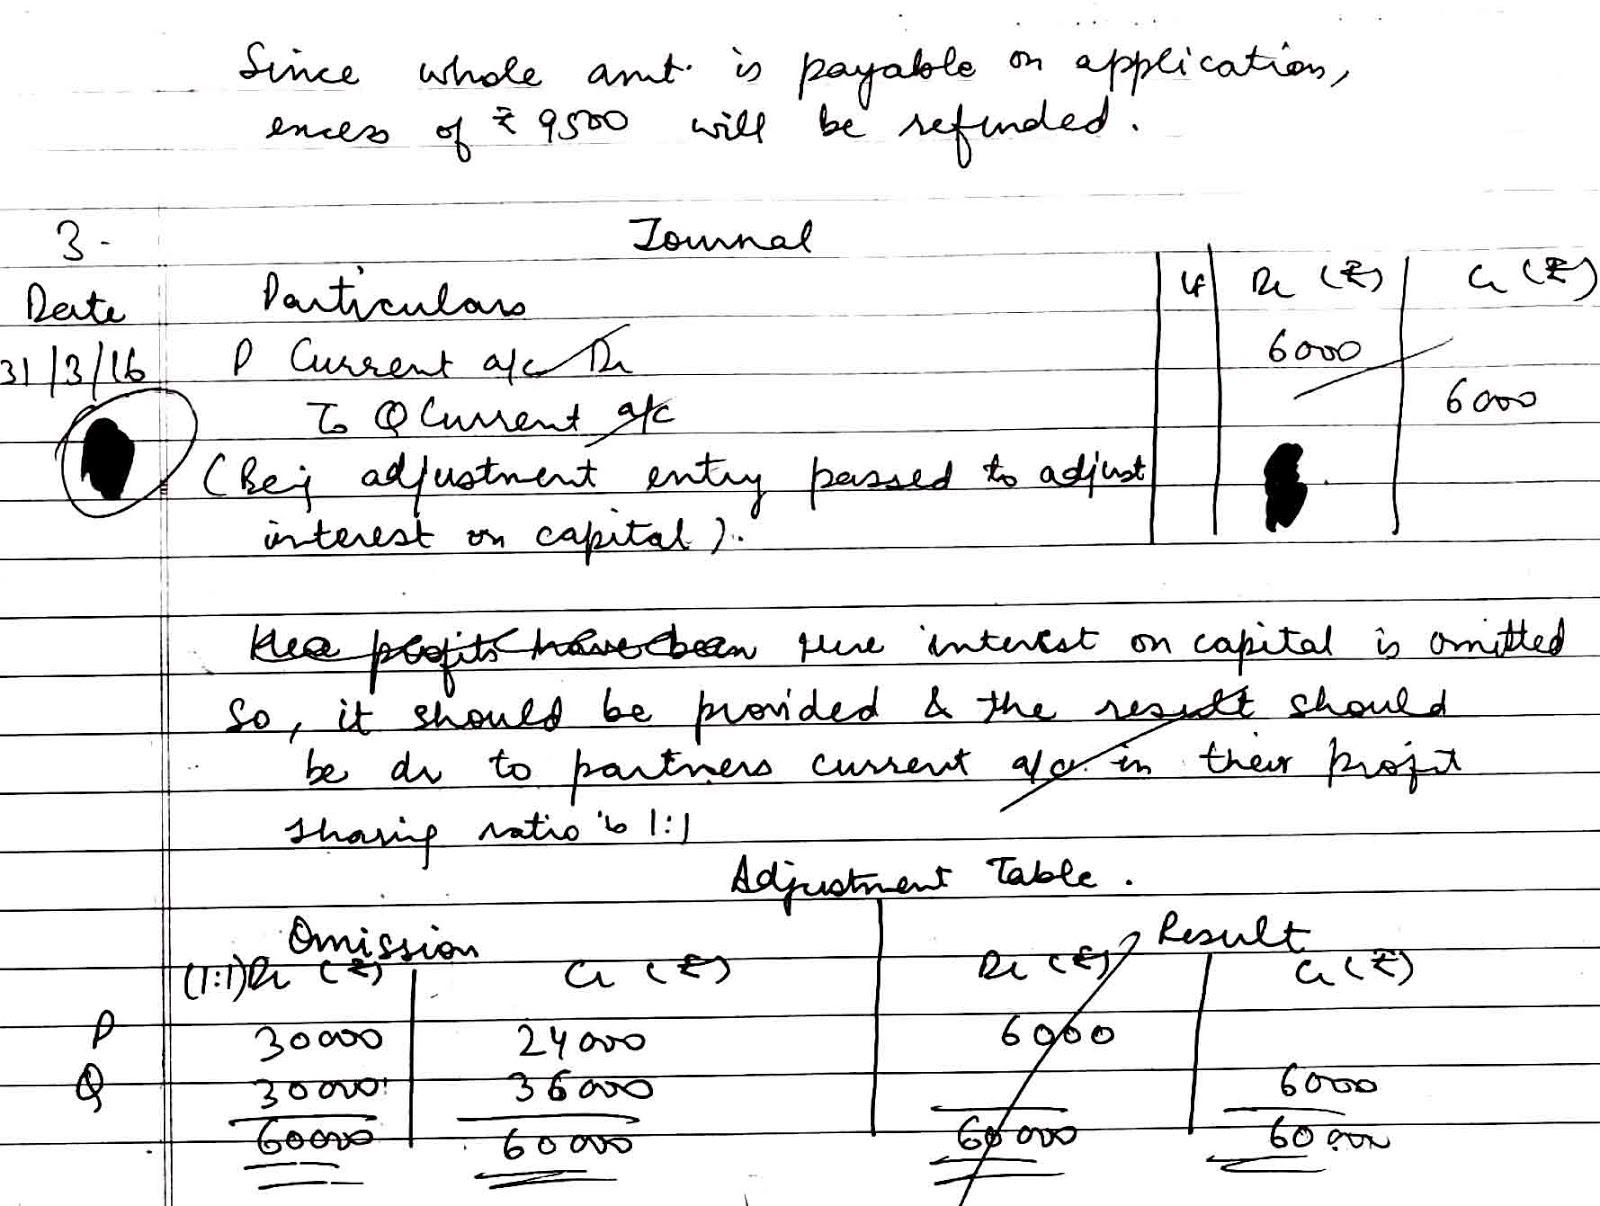 cbse class 12th Accountancy Topper answer sheet